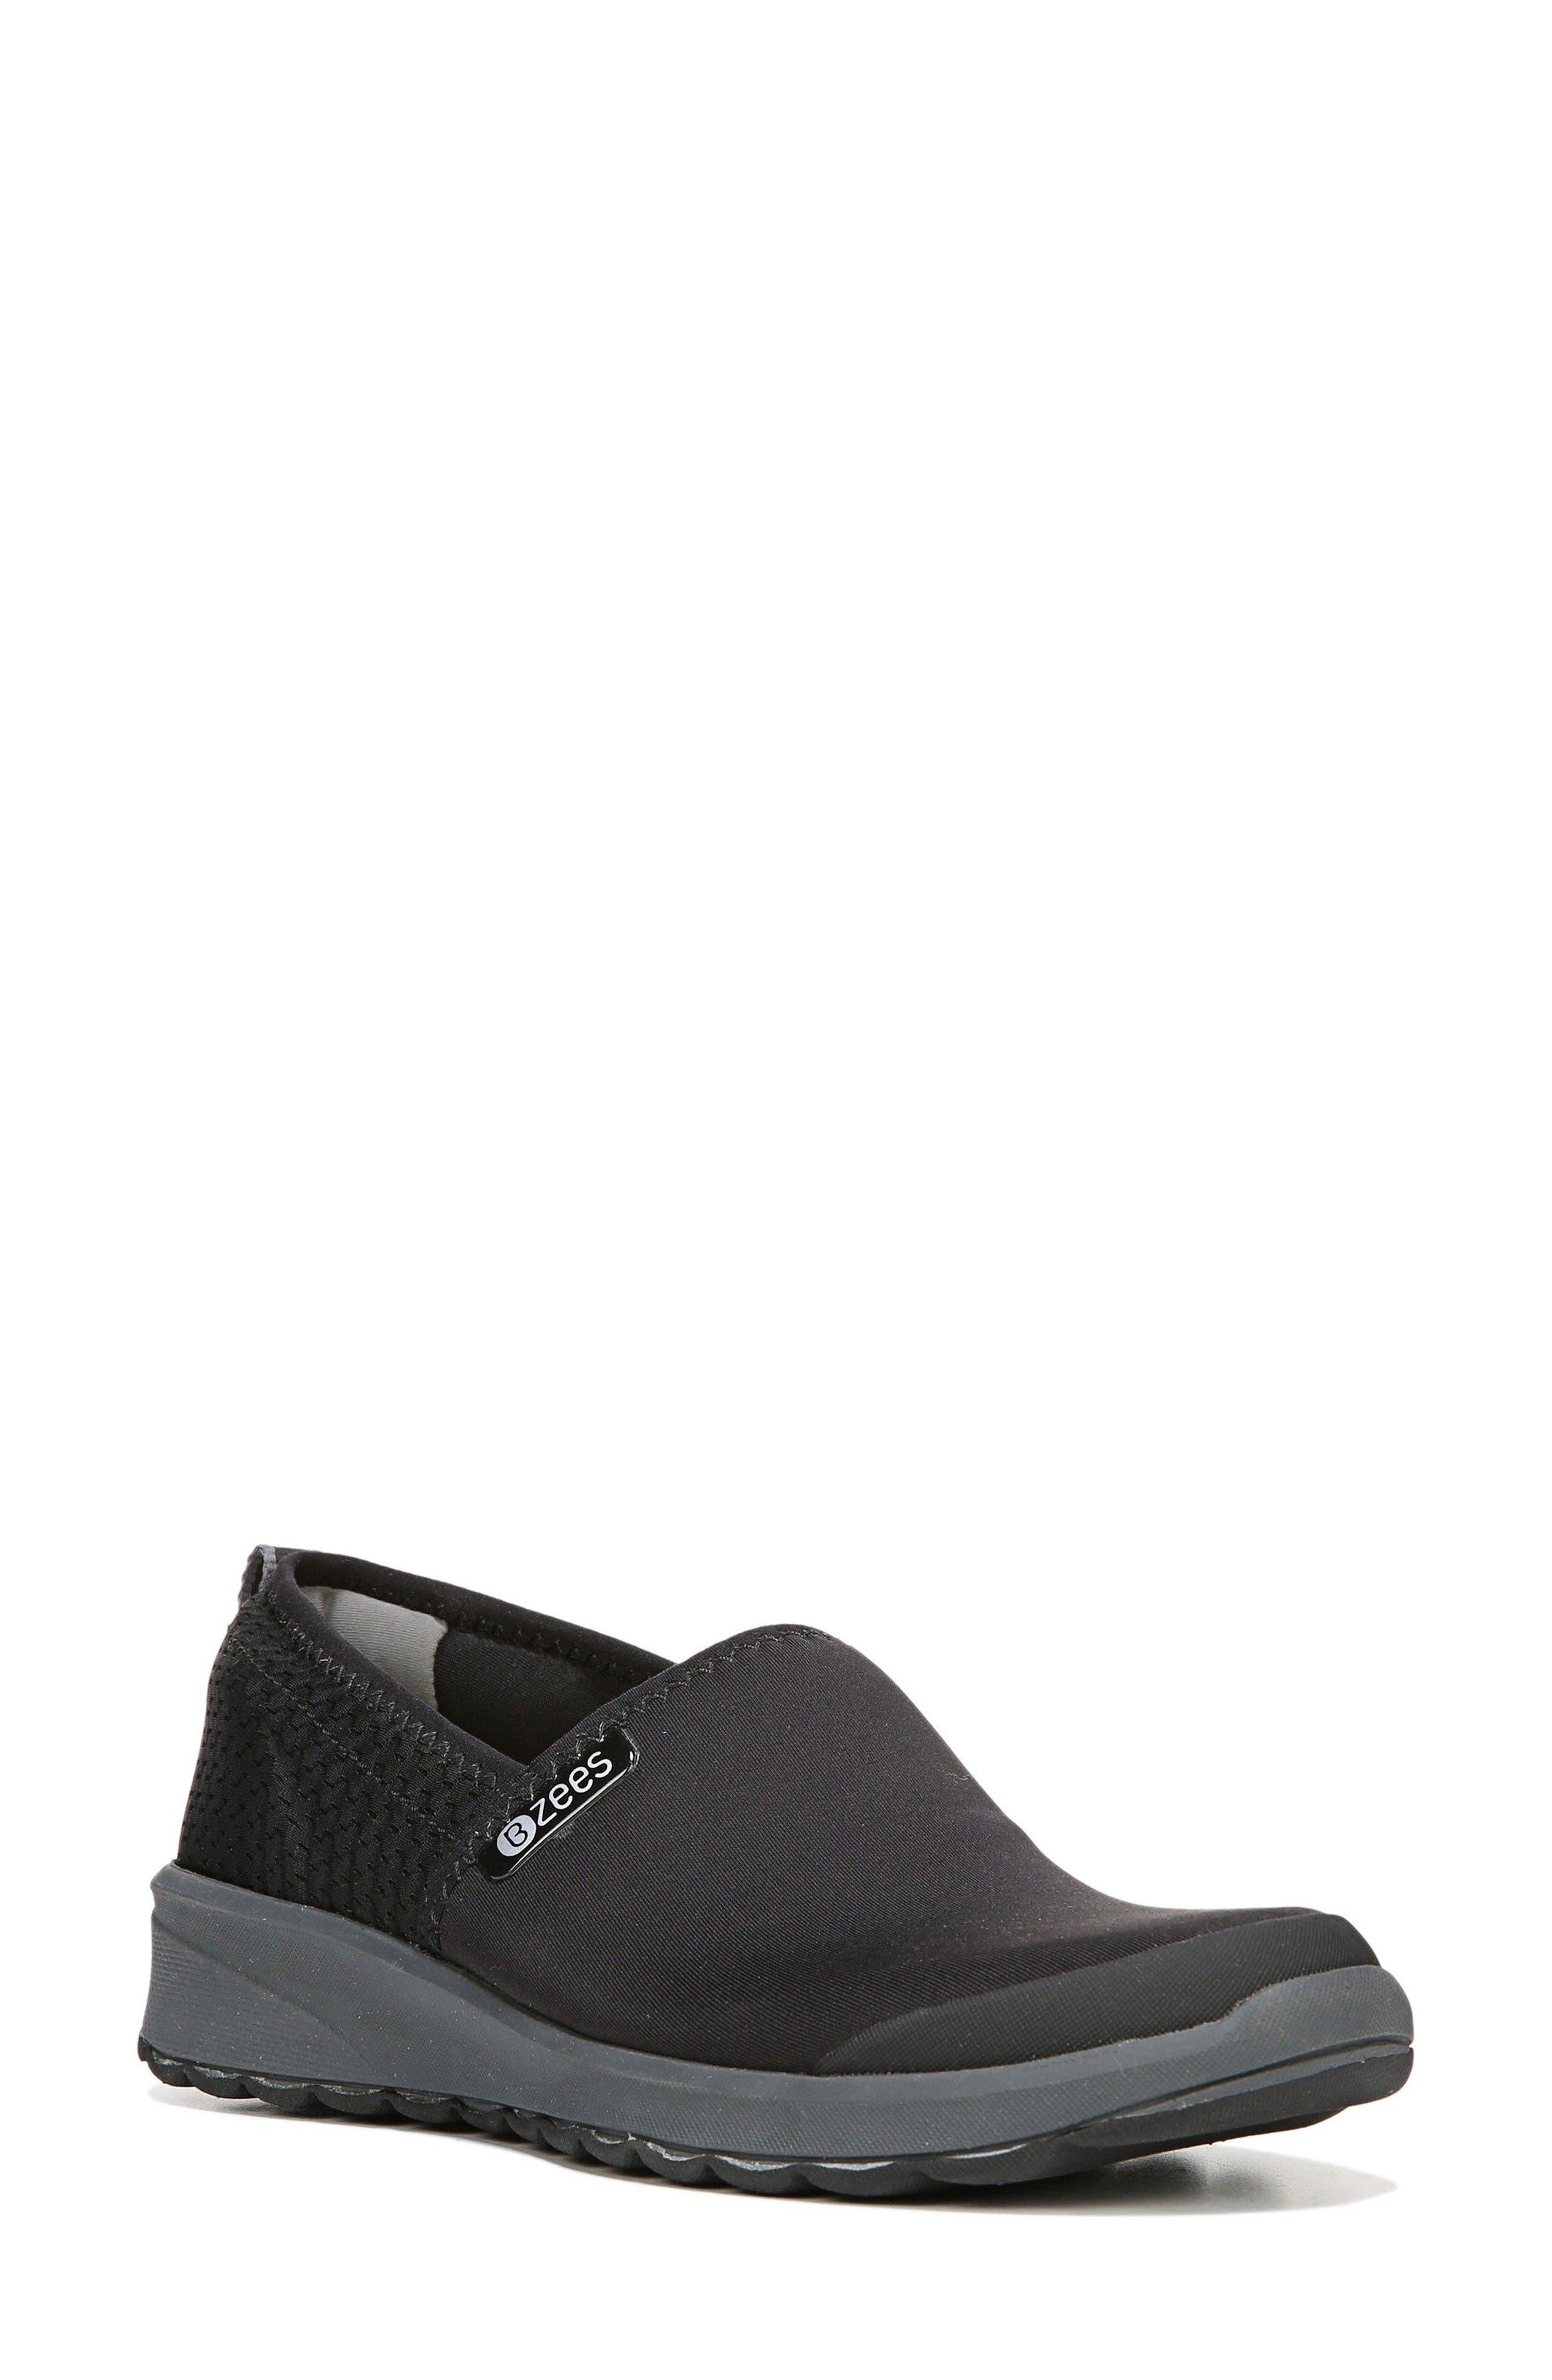 Glee Slip-On Sneaker,                             Main thumbnail 1, color,                             Black Fabric